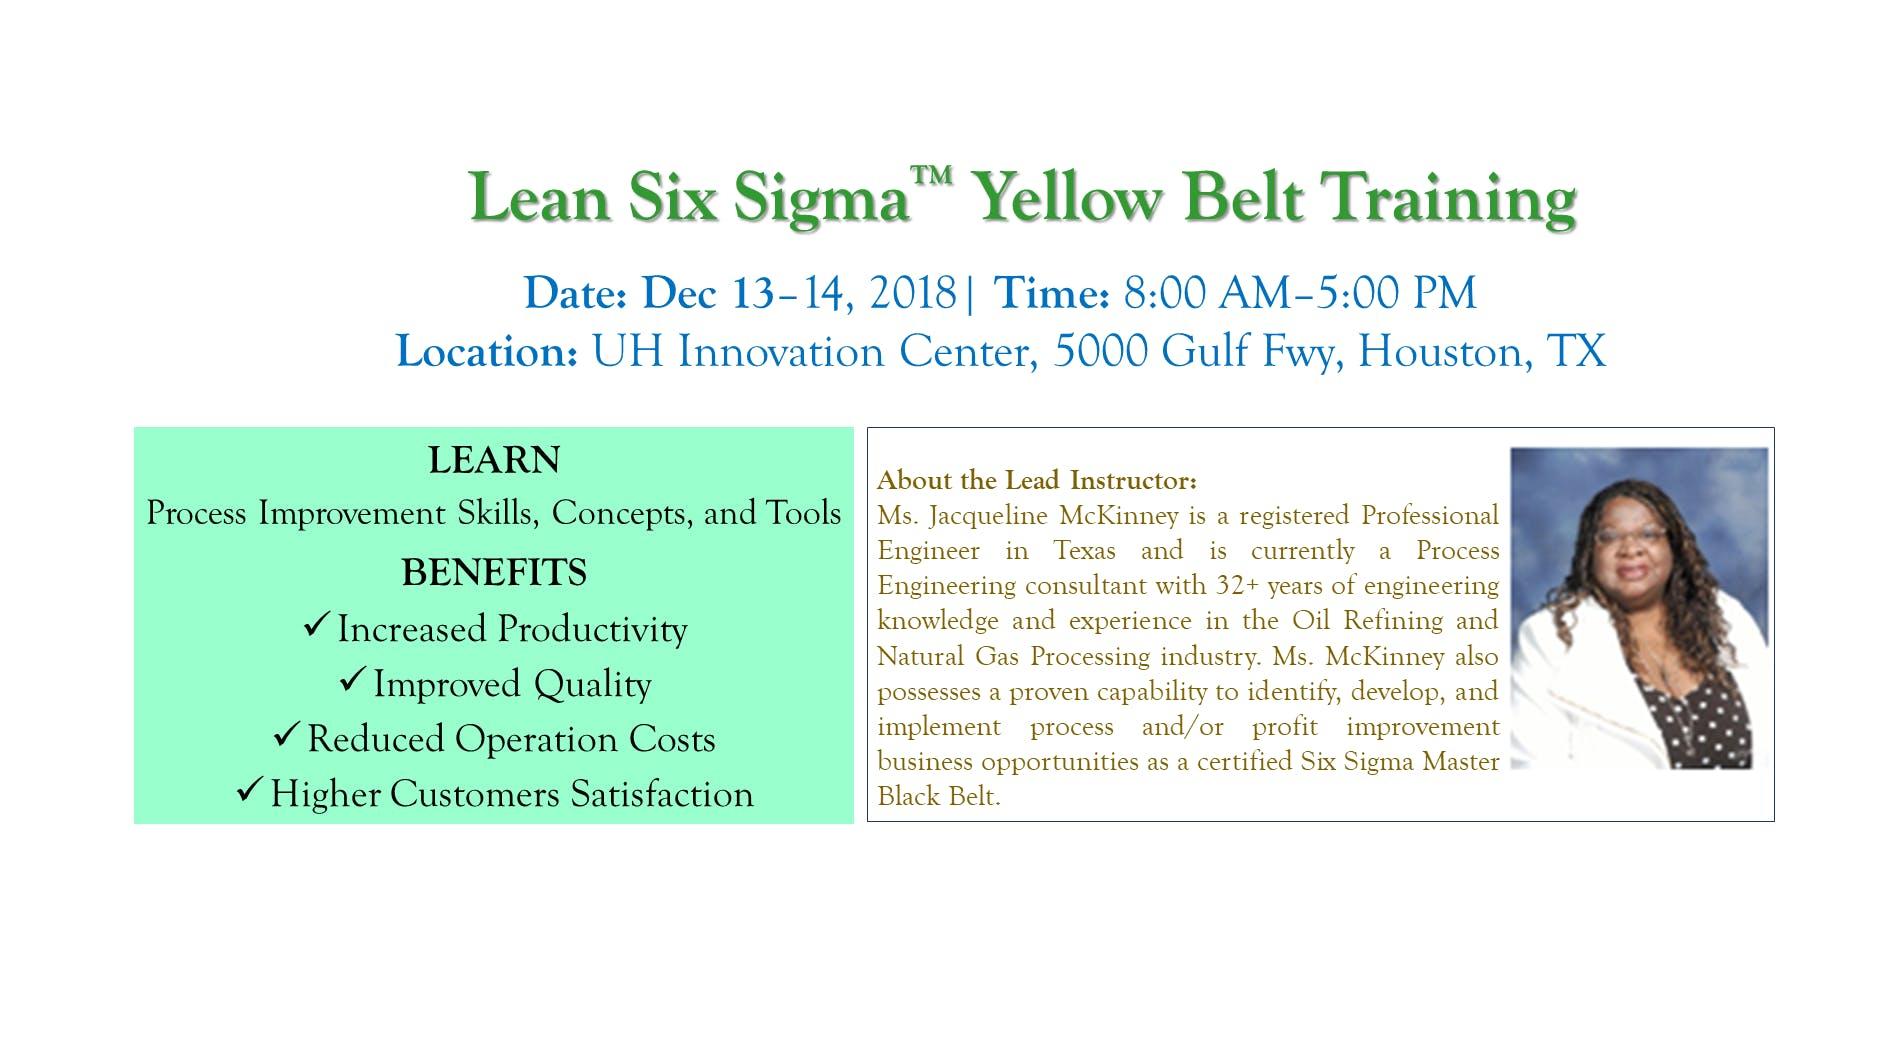 Lean Six Sigma Yellow Belt Training 13 Dec 2018